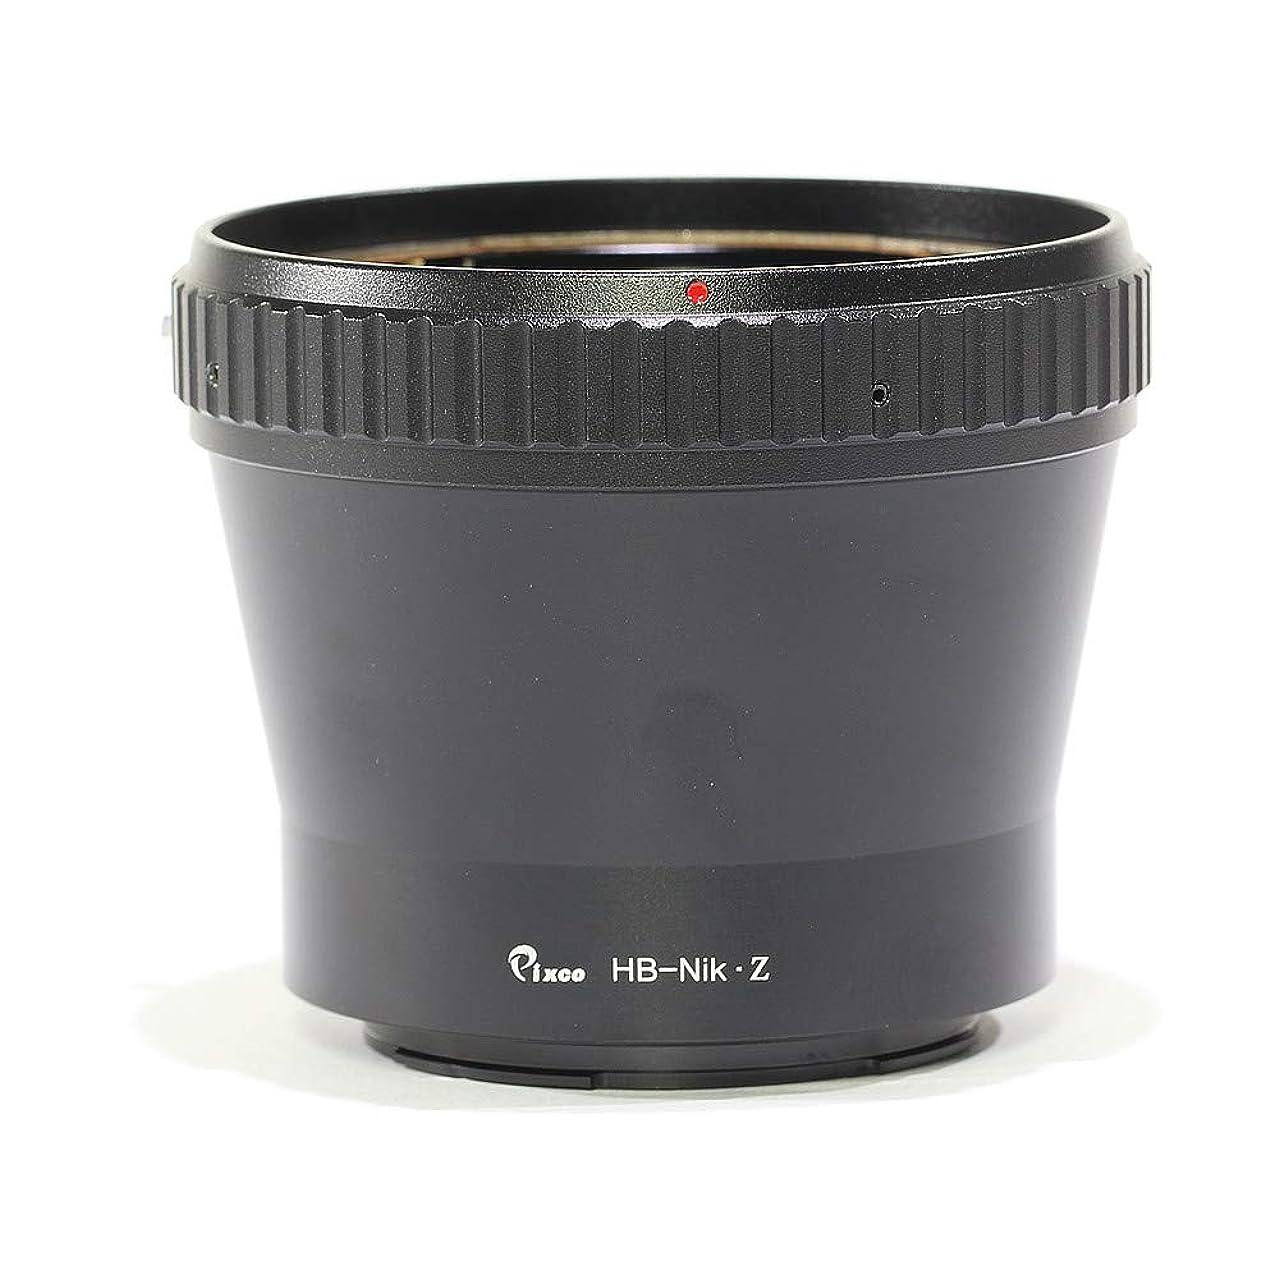 Pixco Lens Mount Adapter Ring for Hasselblad V Lens to Nikon Z Mount Camera Nikon Z6 Nikon Z7